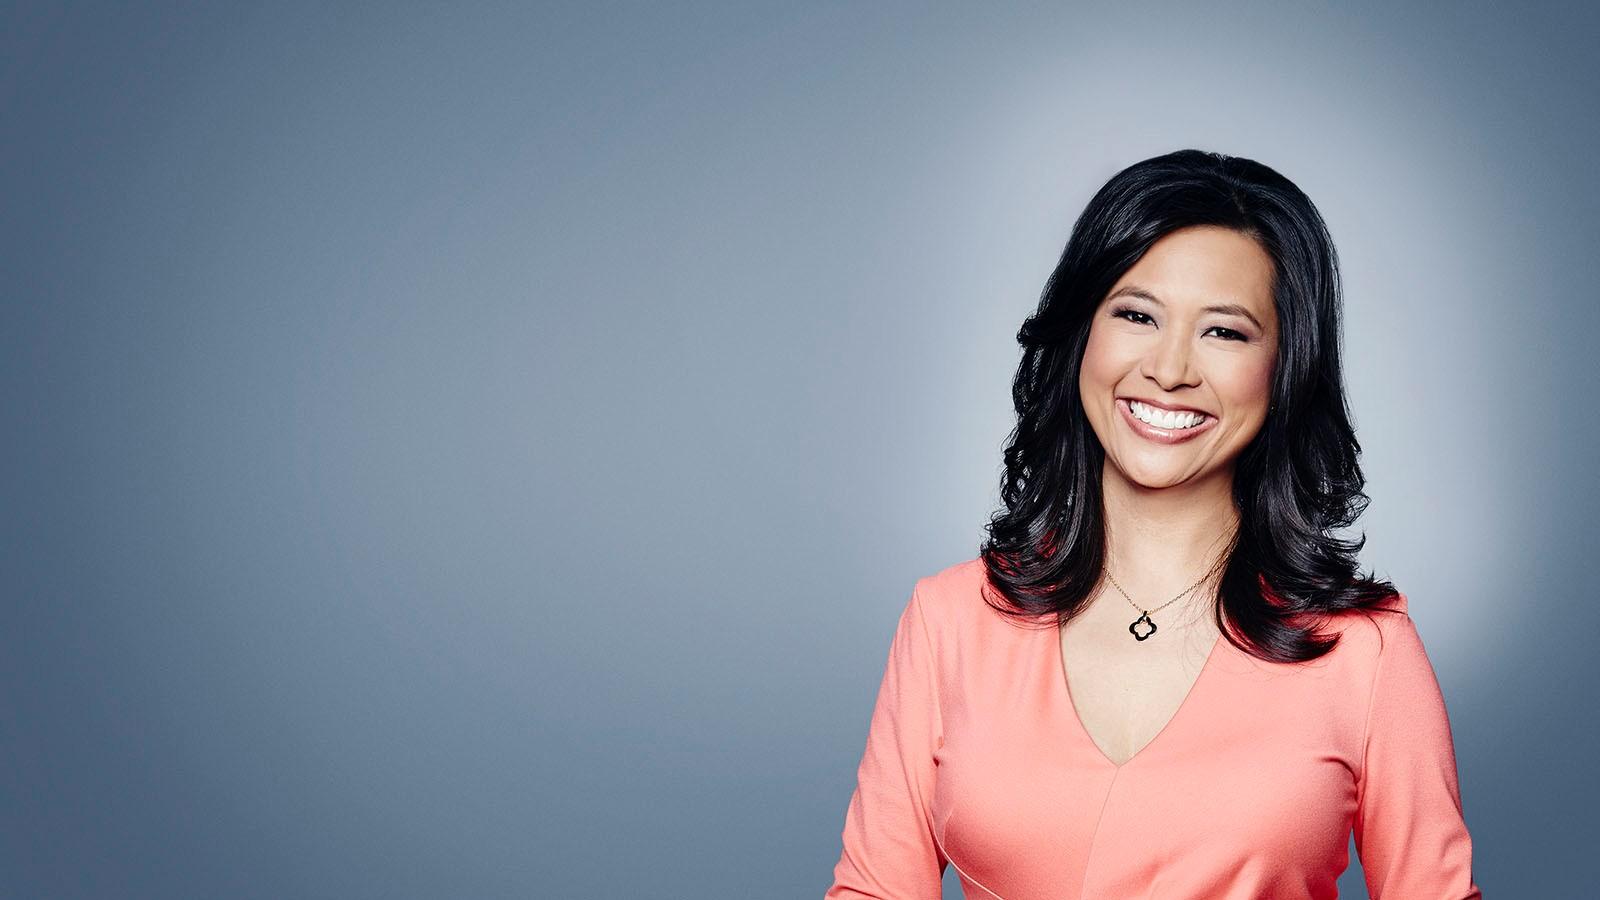 cnn profiles - maribel aber - correspondent - cnn